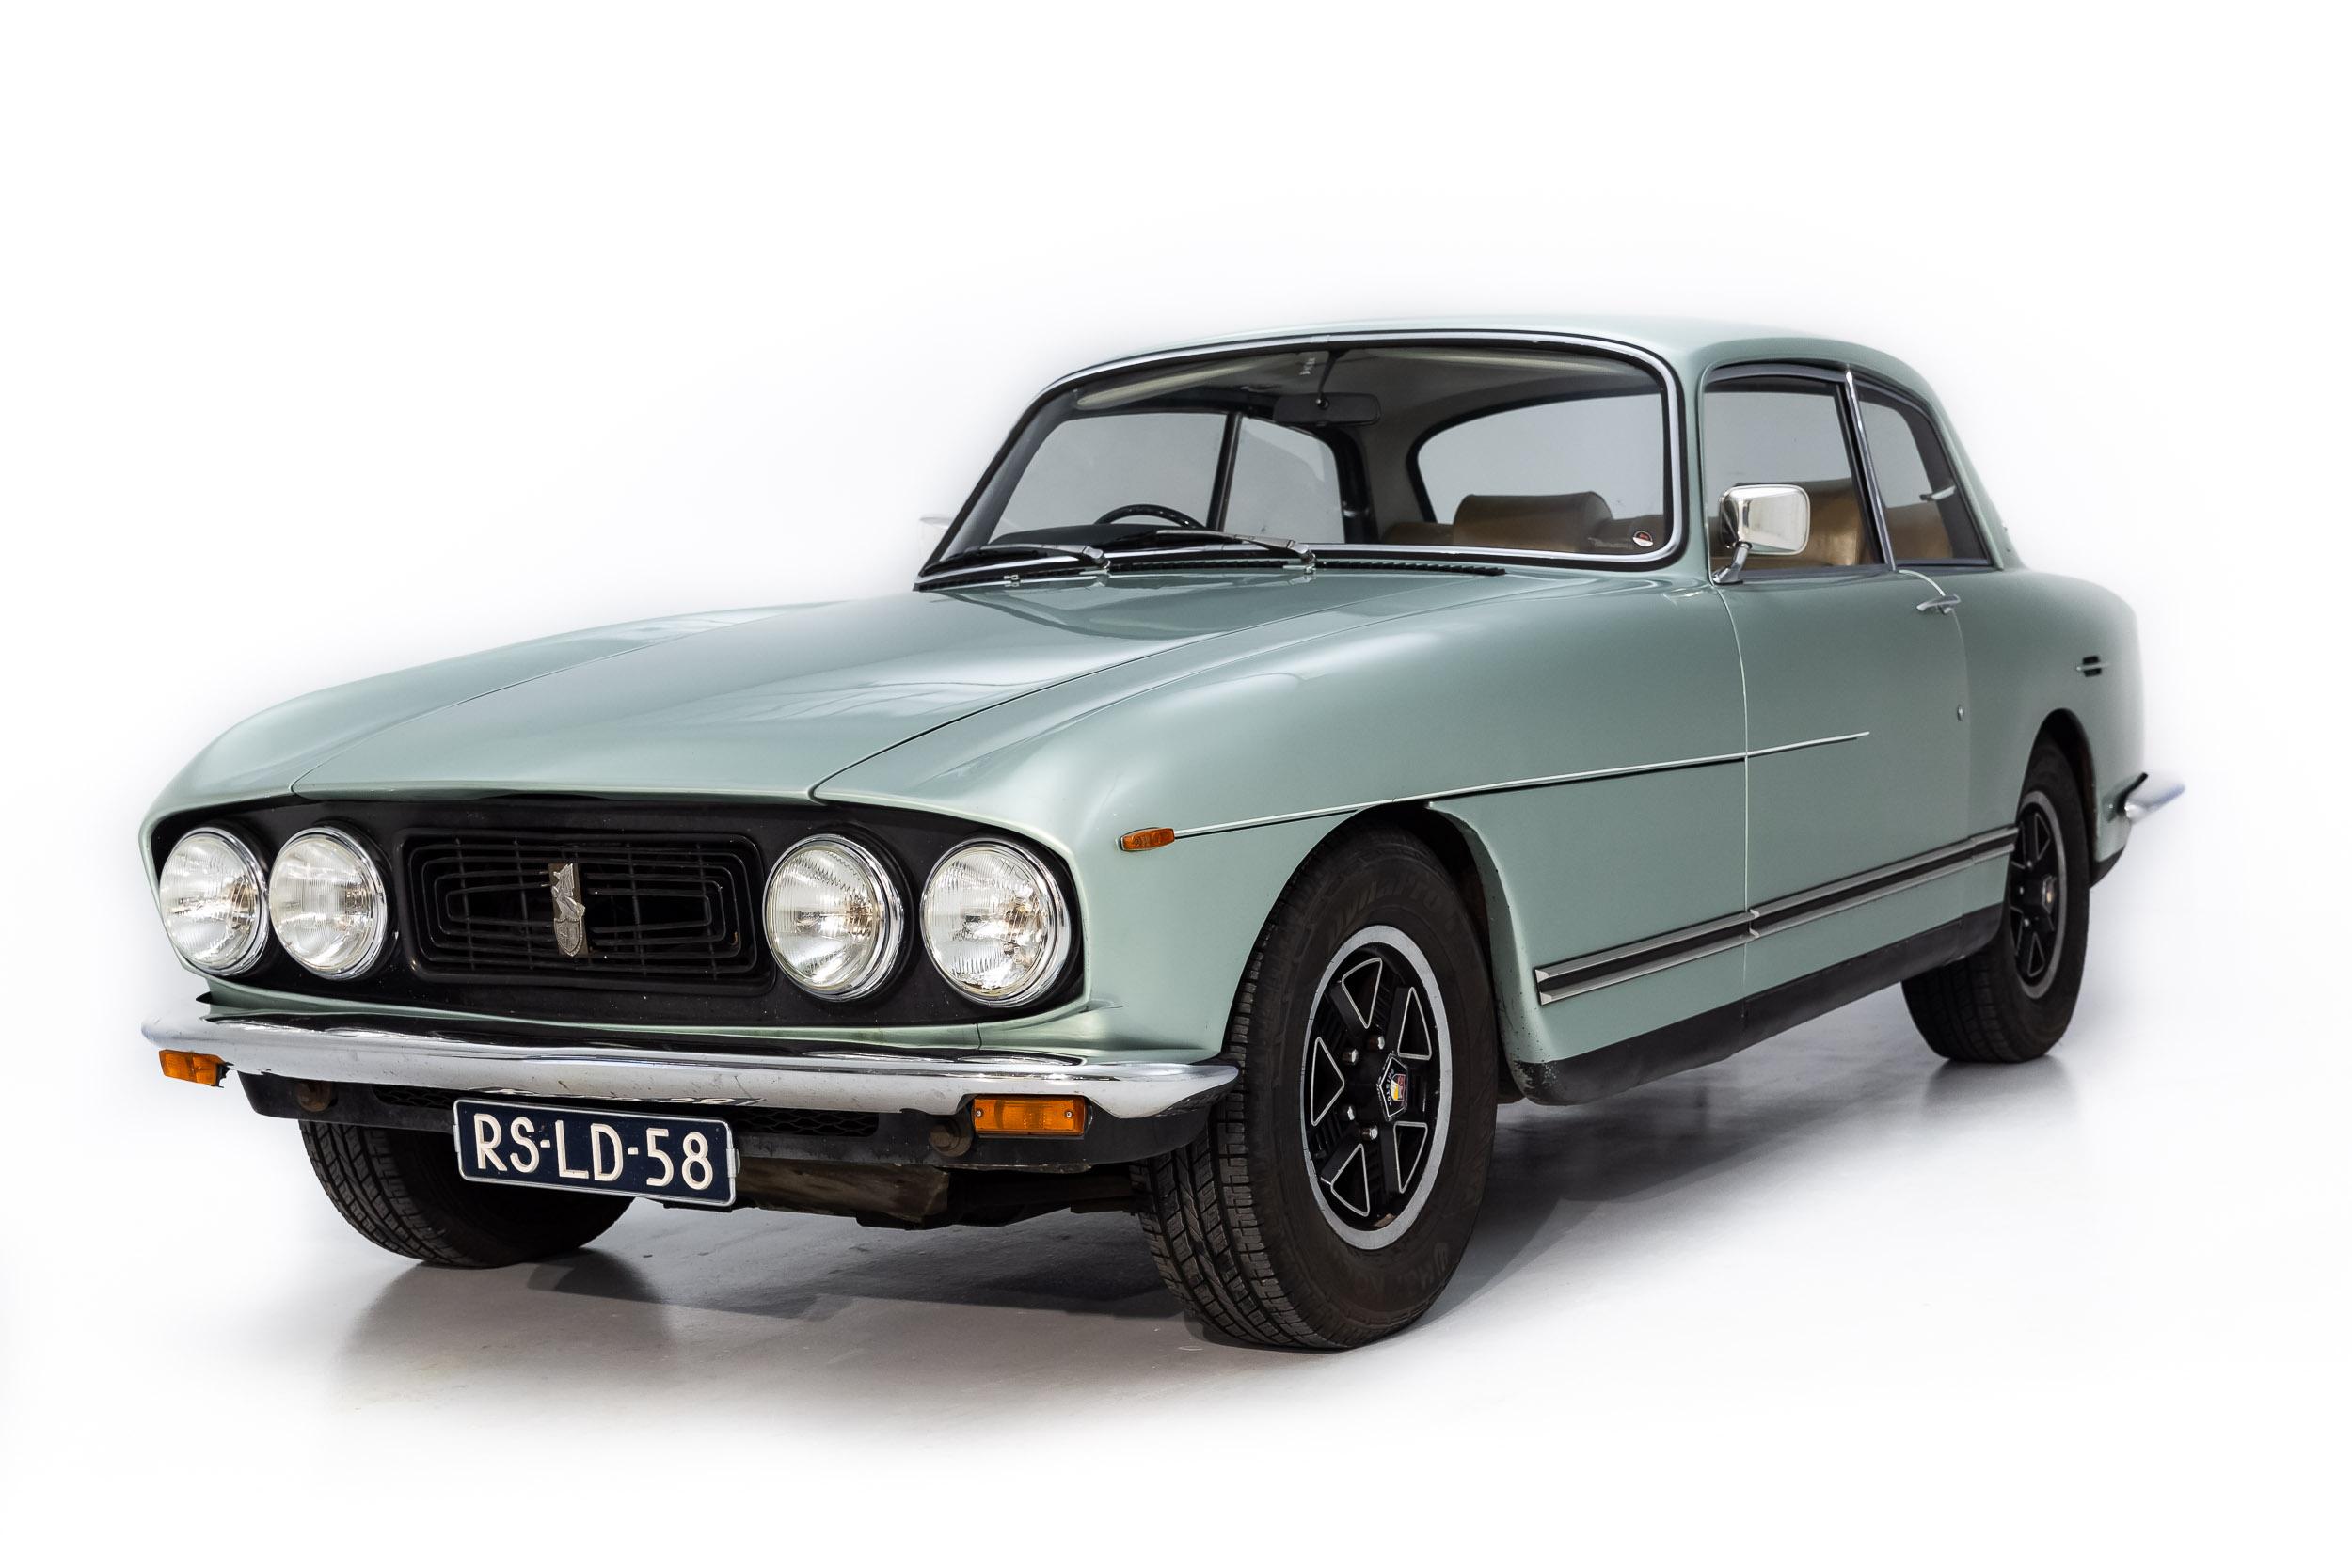 1976 Bristol 411 S5